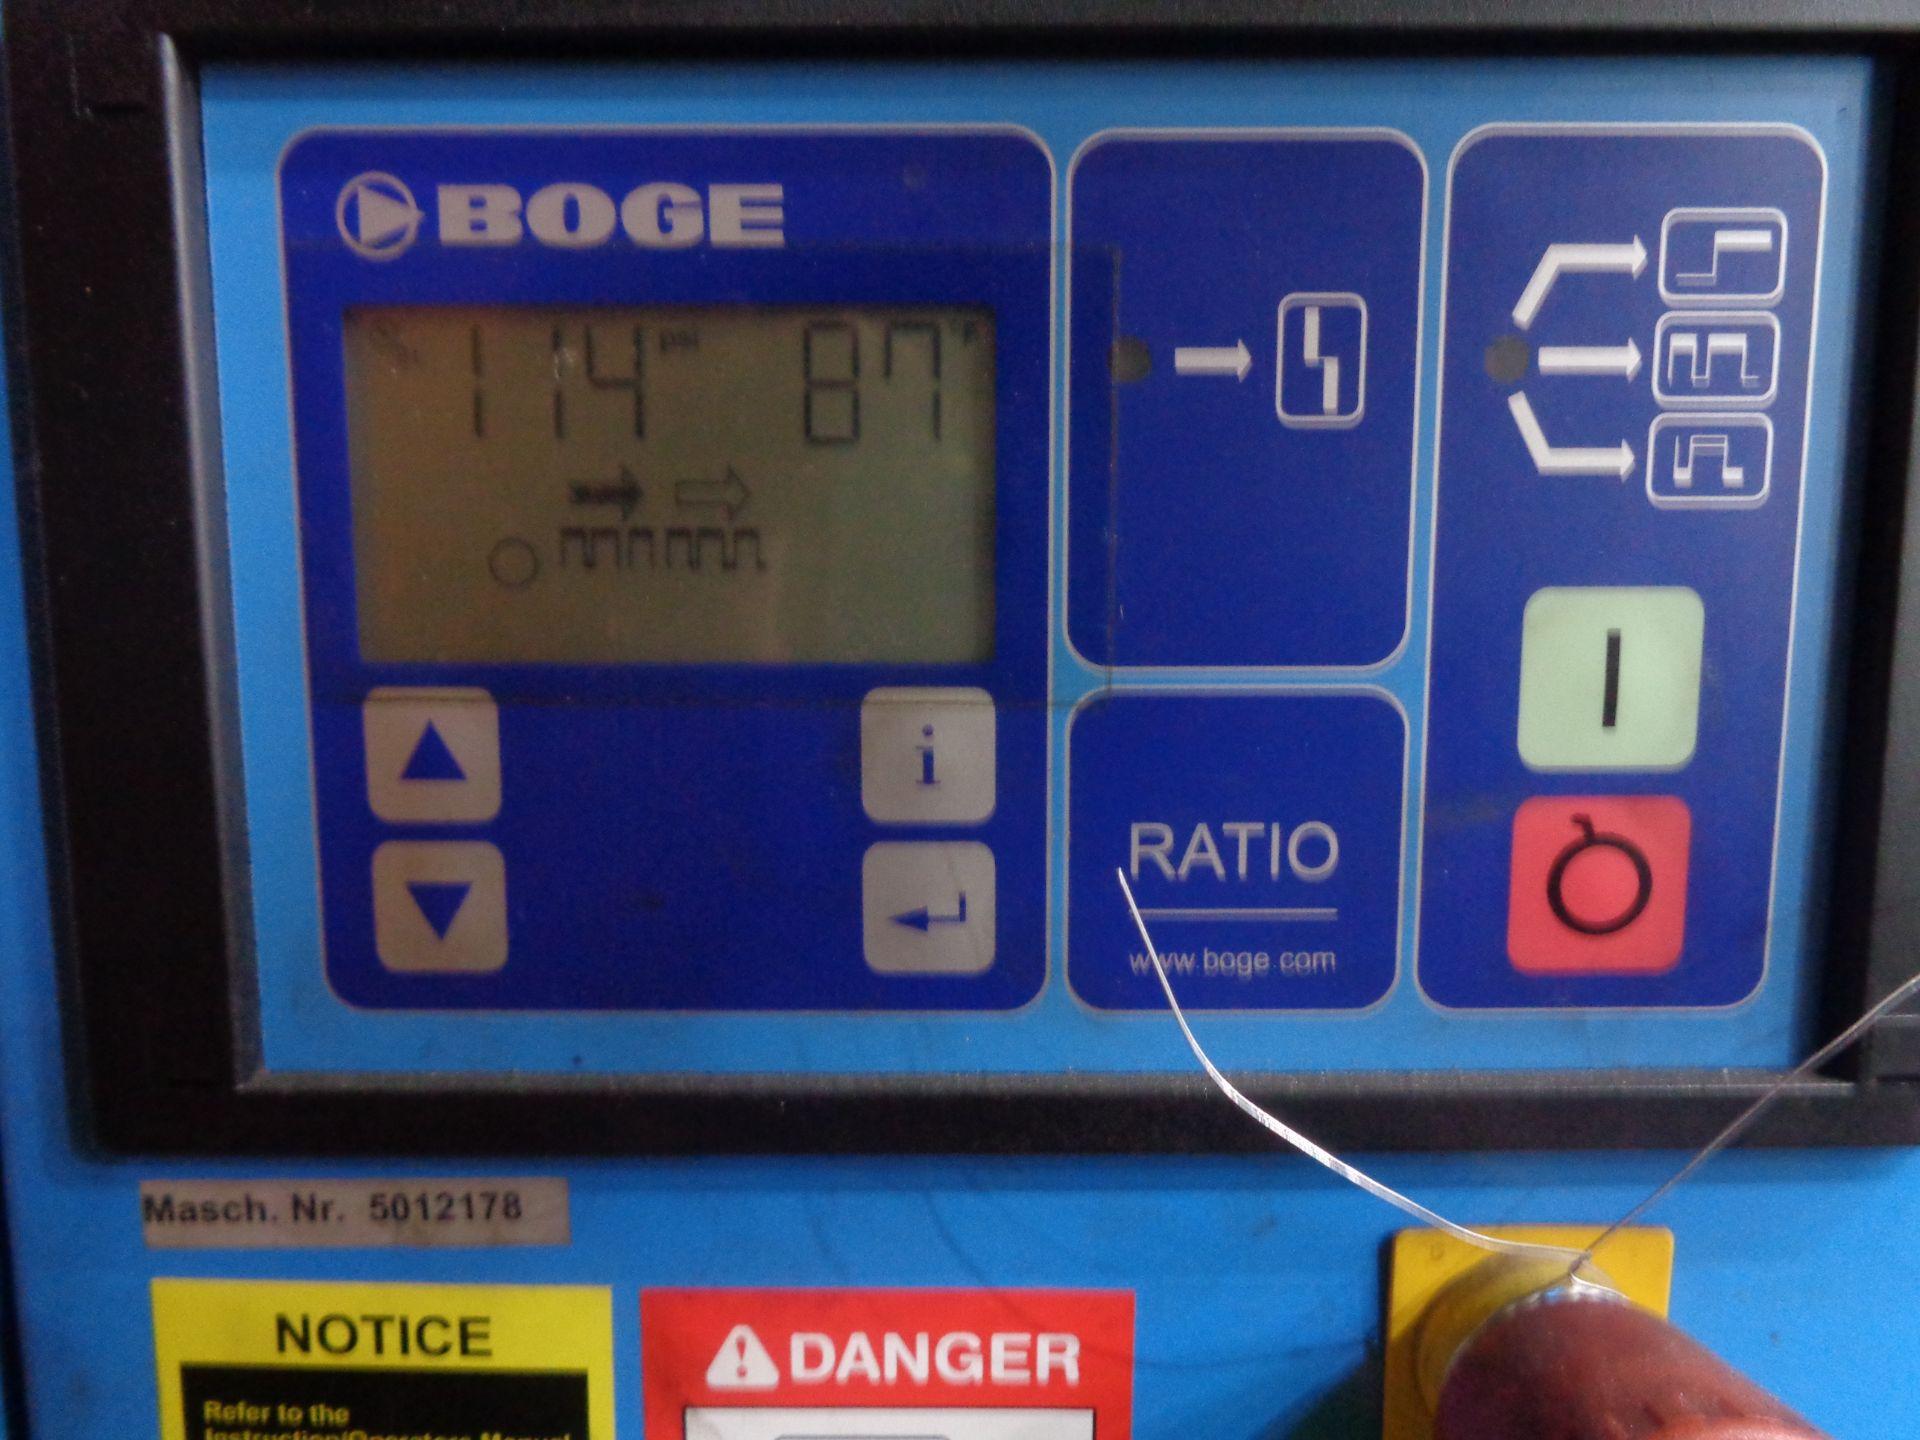 Boge Compressor and Tank - Image 4 of 5